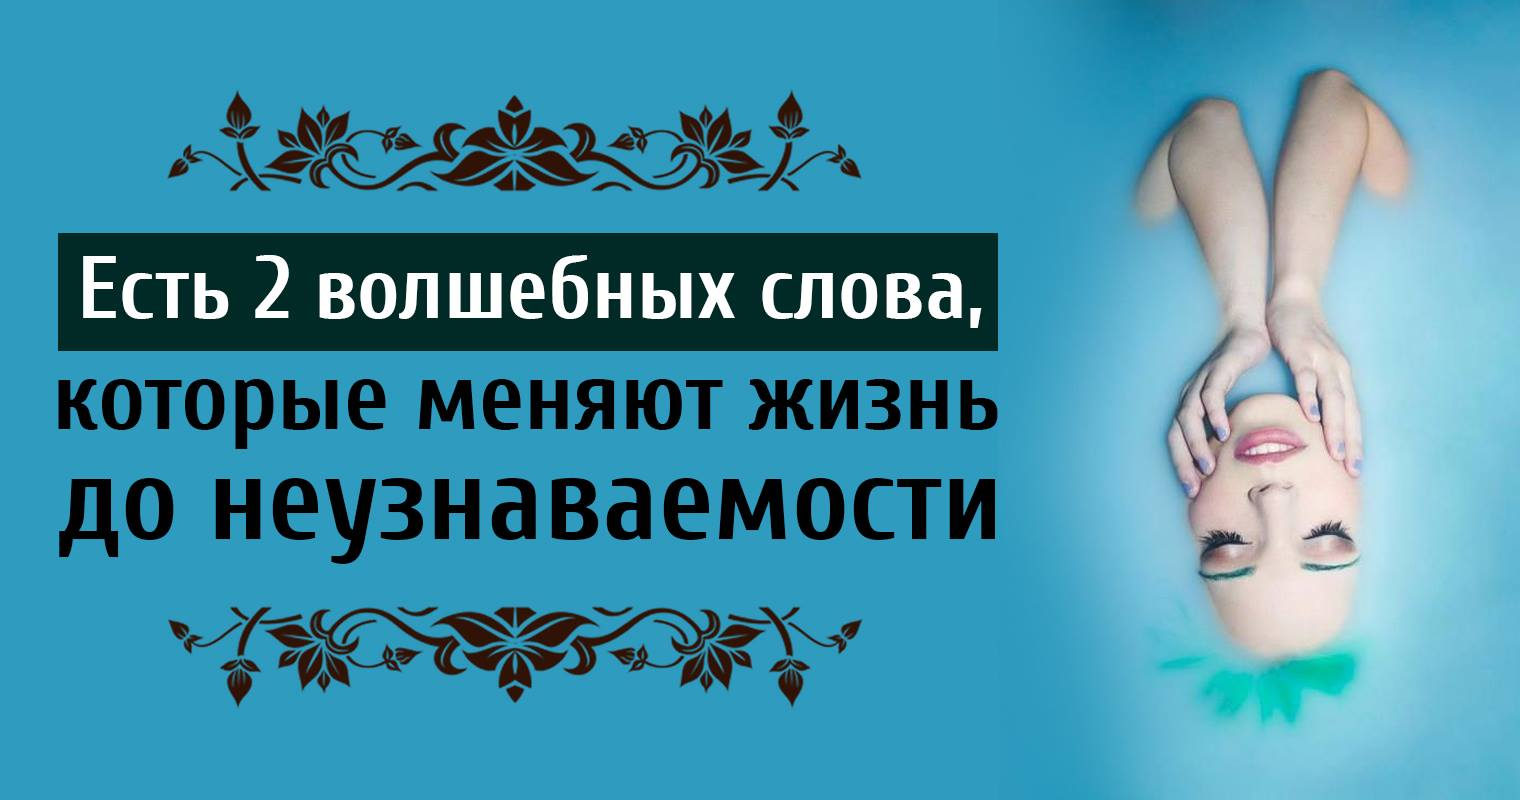 https://2.bp.blogspot.com/-XQ1IvJLj5mg/Wlin9xH4c4I/AAAAAAAAPEY/cetXH6HDr3cX92nwEodErkzlYIcBEp-0ACLcBGAs/s1600/26854160_2055198008043621_1539622041_o.jpg